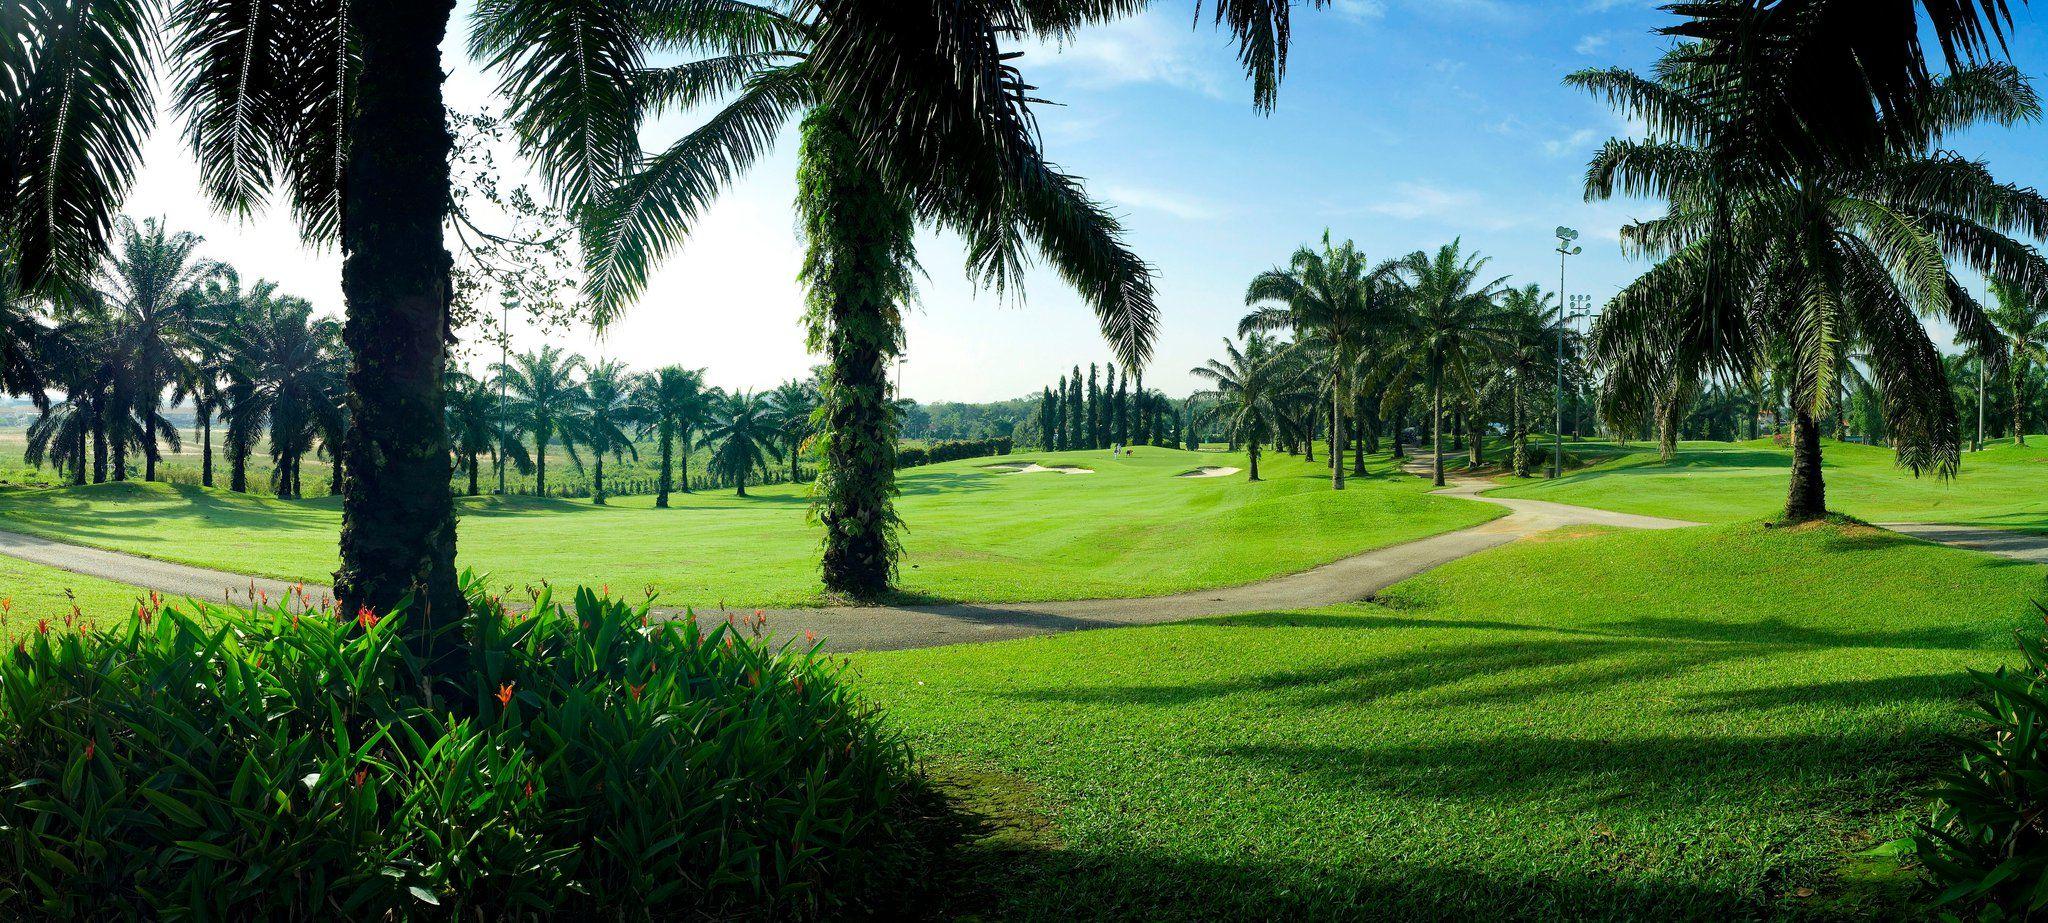 Bukit kemuning golf club cover picture